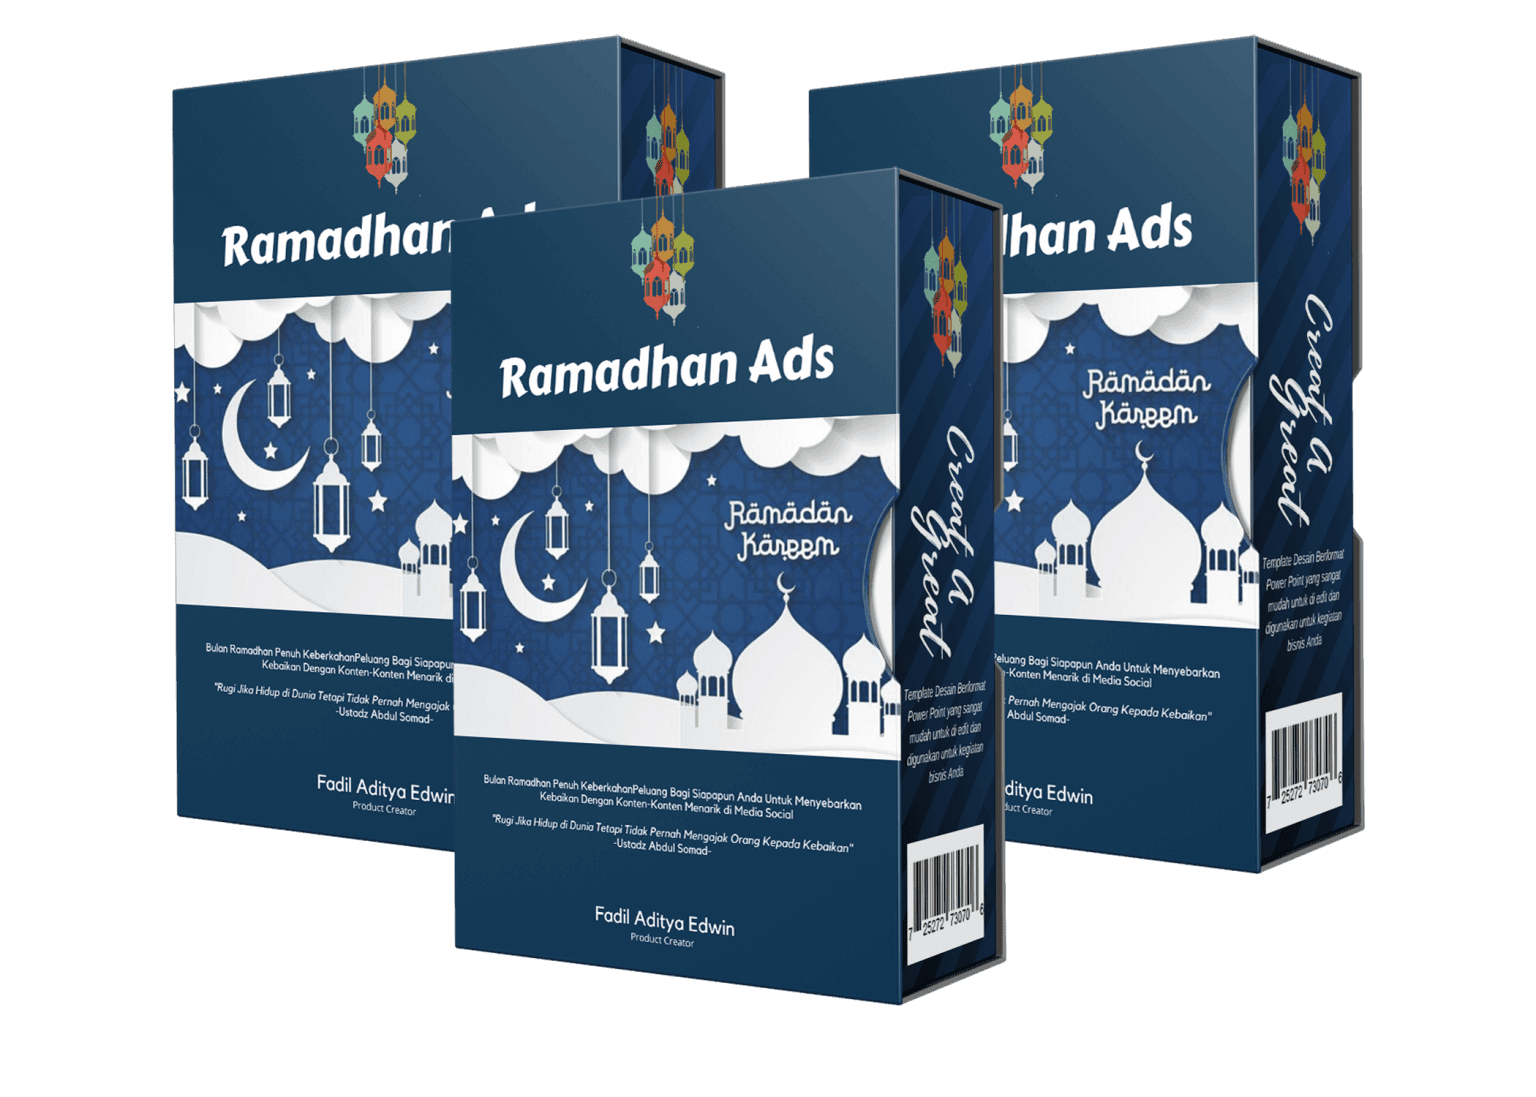 Ramadhan Ads